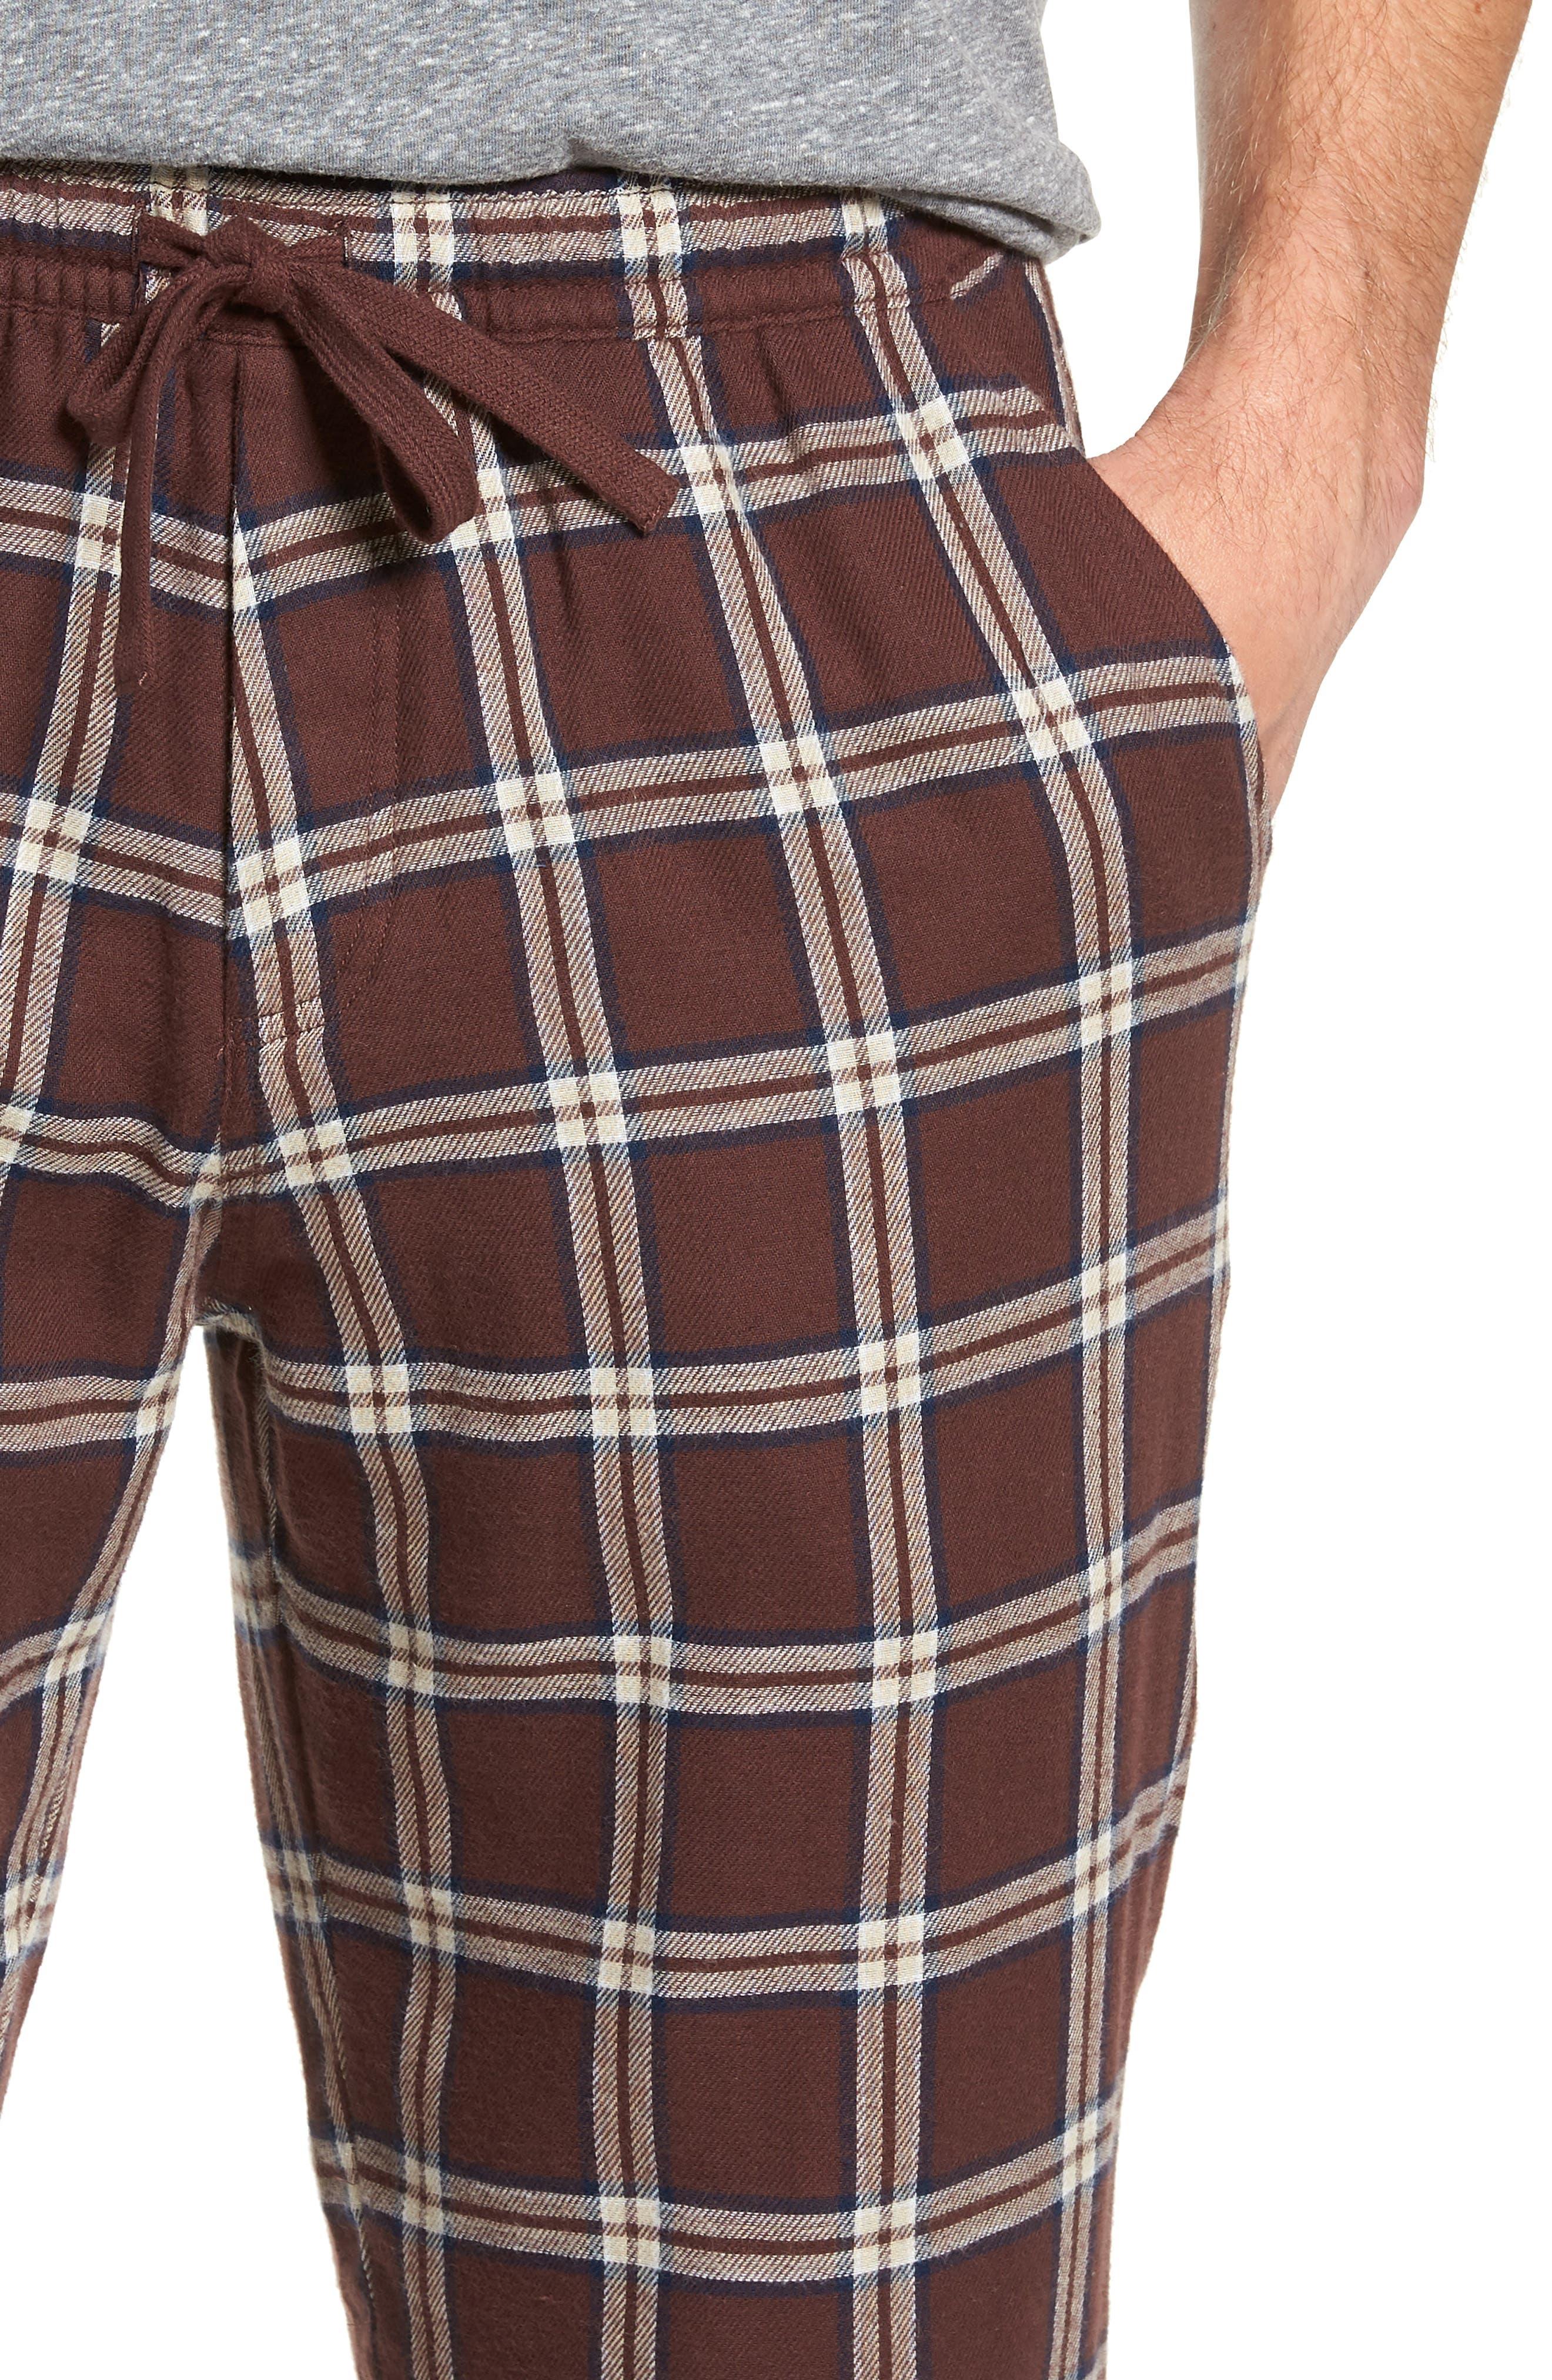 Grant Pajama Set,                             Alternate thumbnail 4, color,                             PORT/ GREY HEATHER